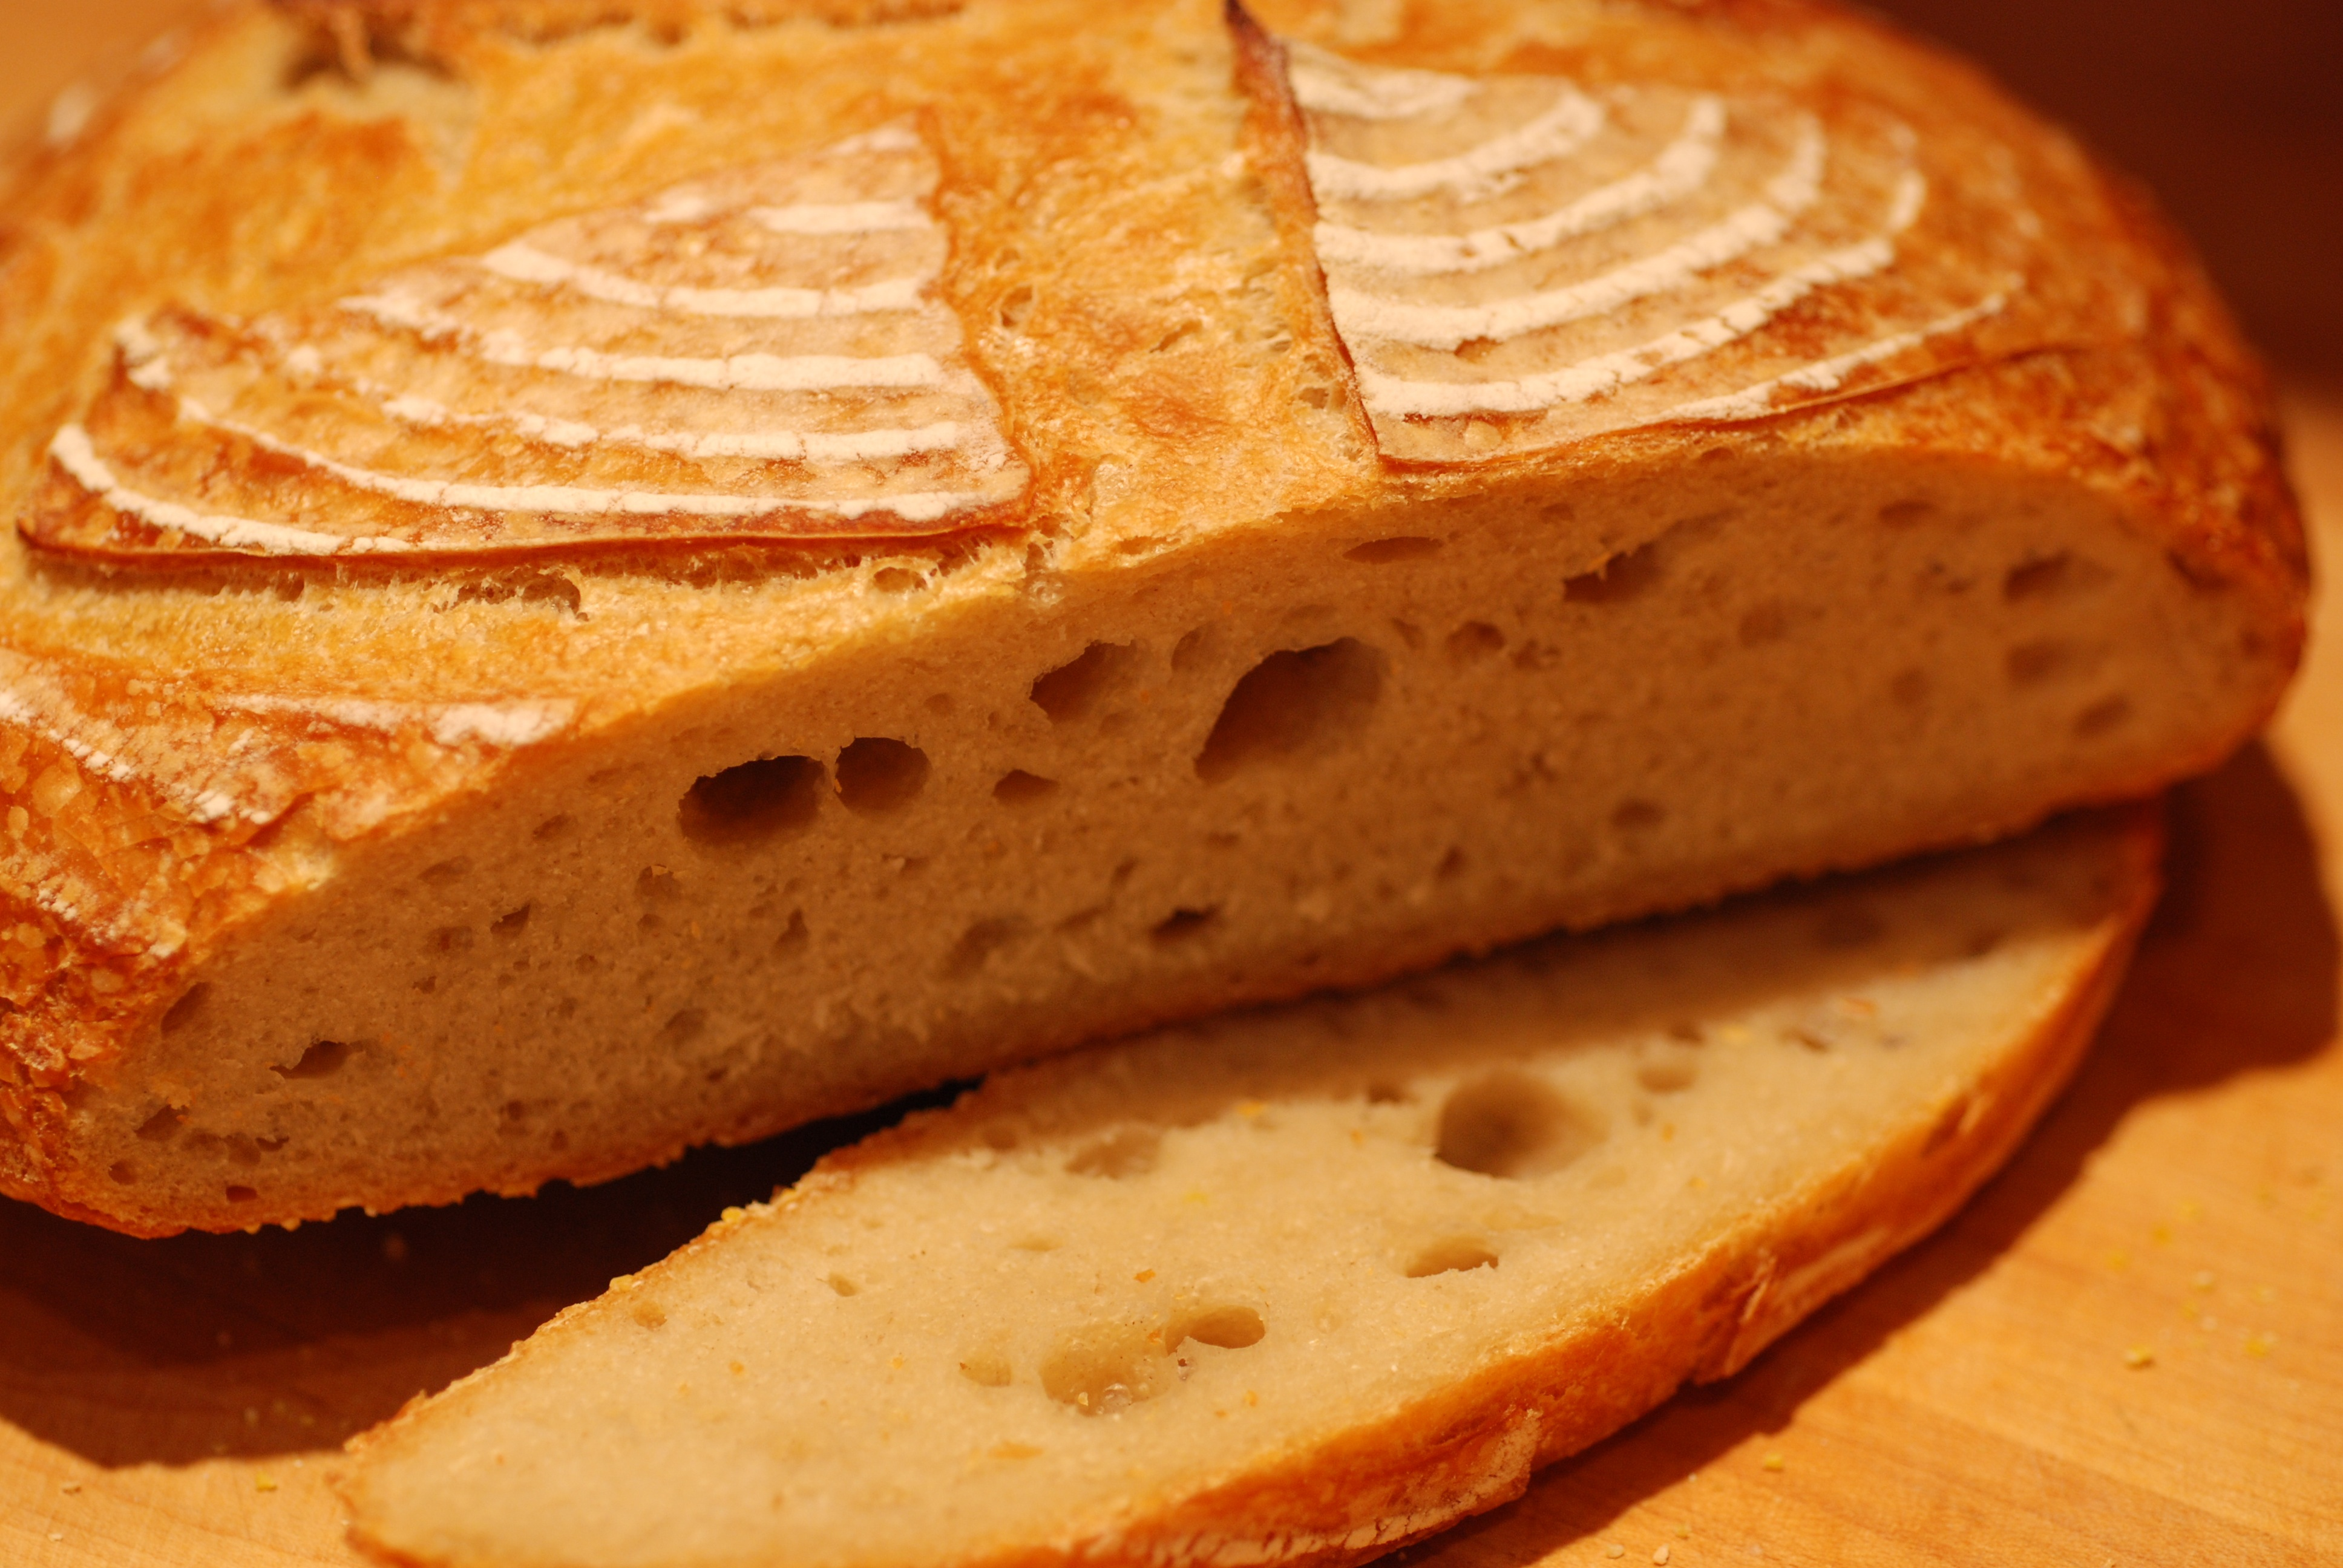 finishedbread